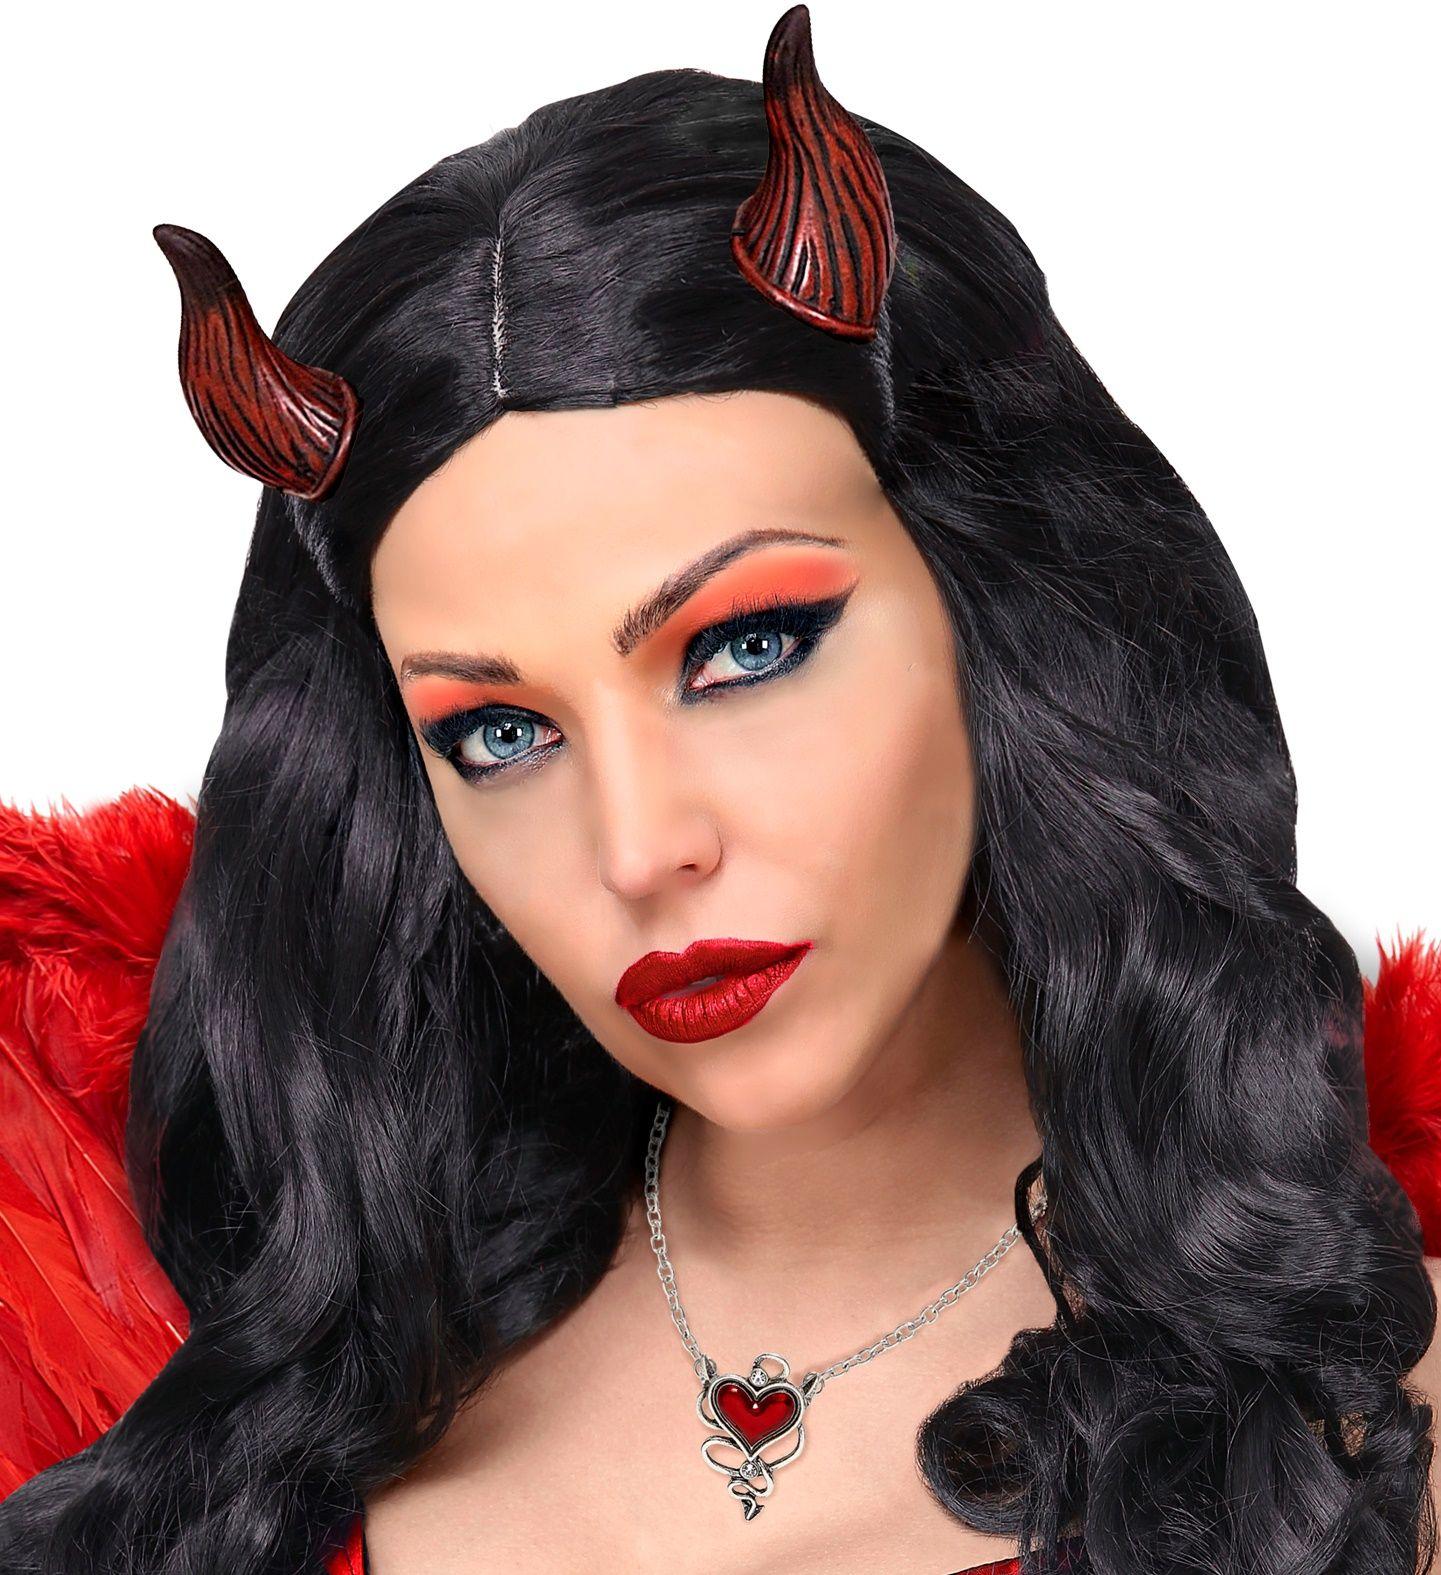 Duivel ketting met rood hartje